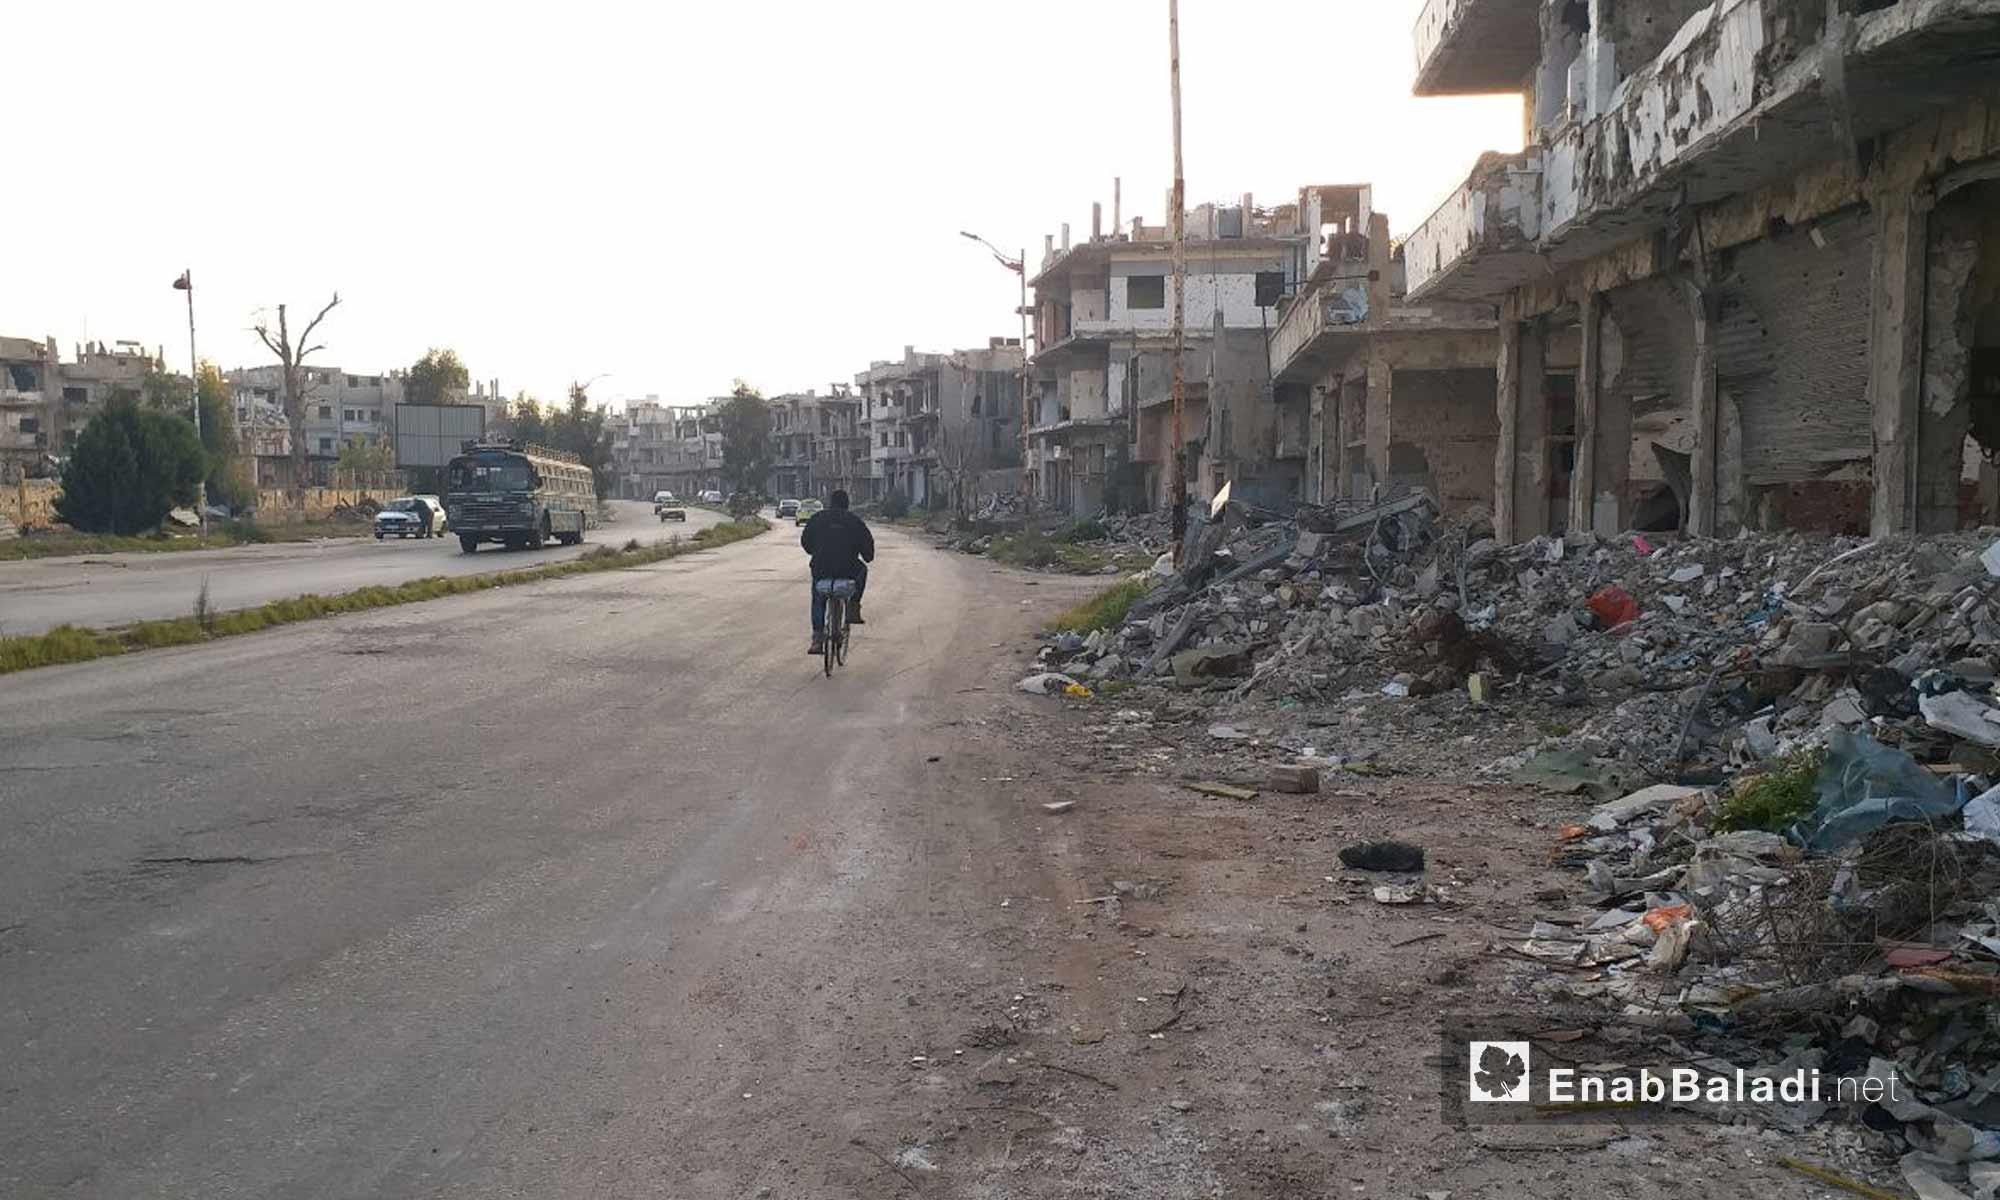 The neighborhoods of al-Kussur in the city of Homs - January 24, 2019 (Enab Baladi)